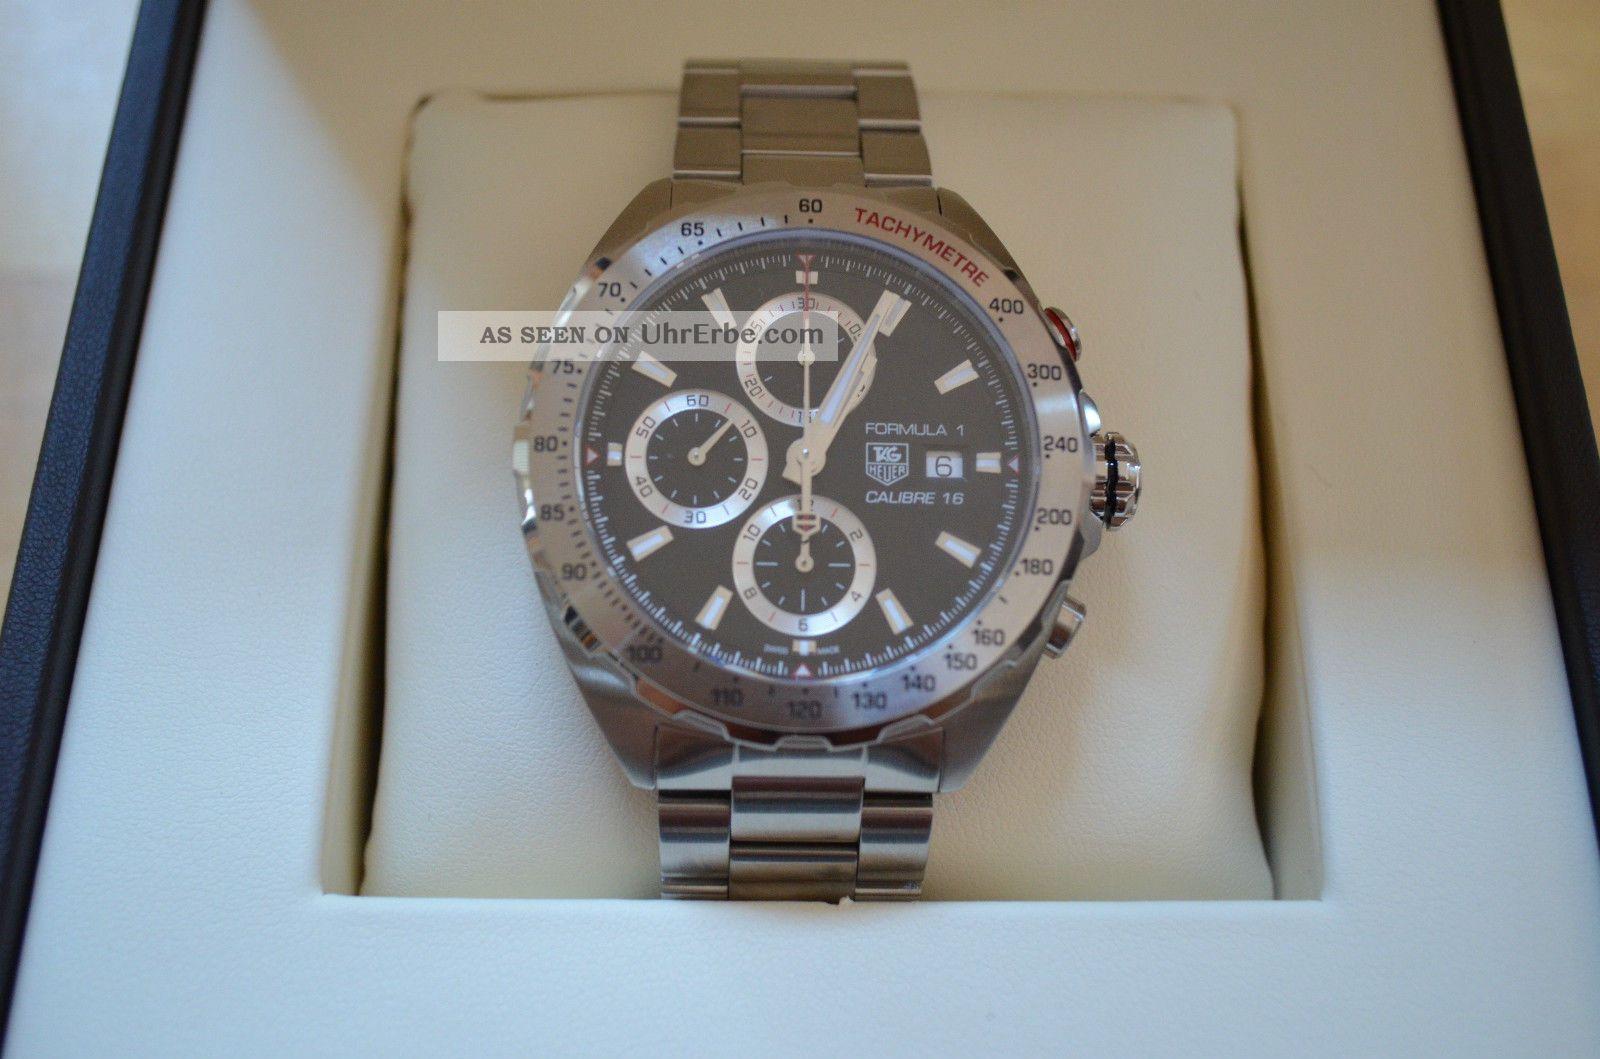 Tag Heuer Formula 1 Chronograph Cal 16 - - Ungetragen Armbanduhren Bild